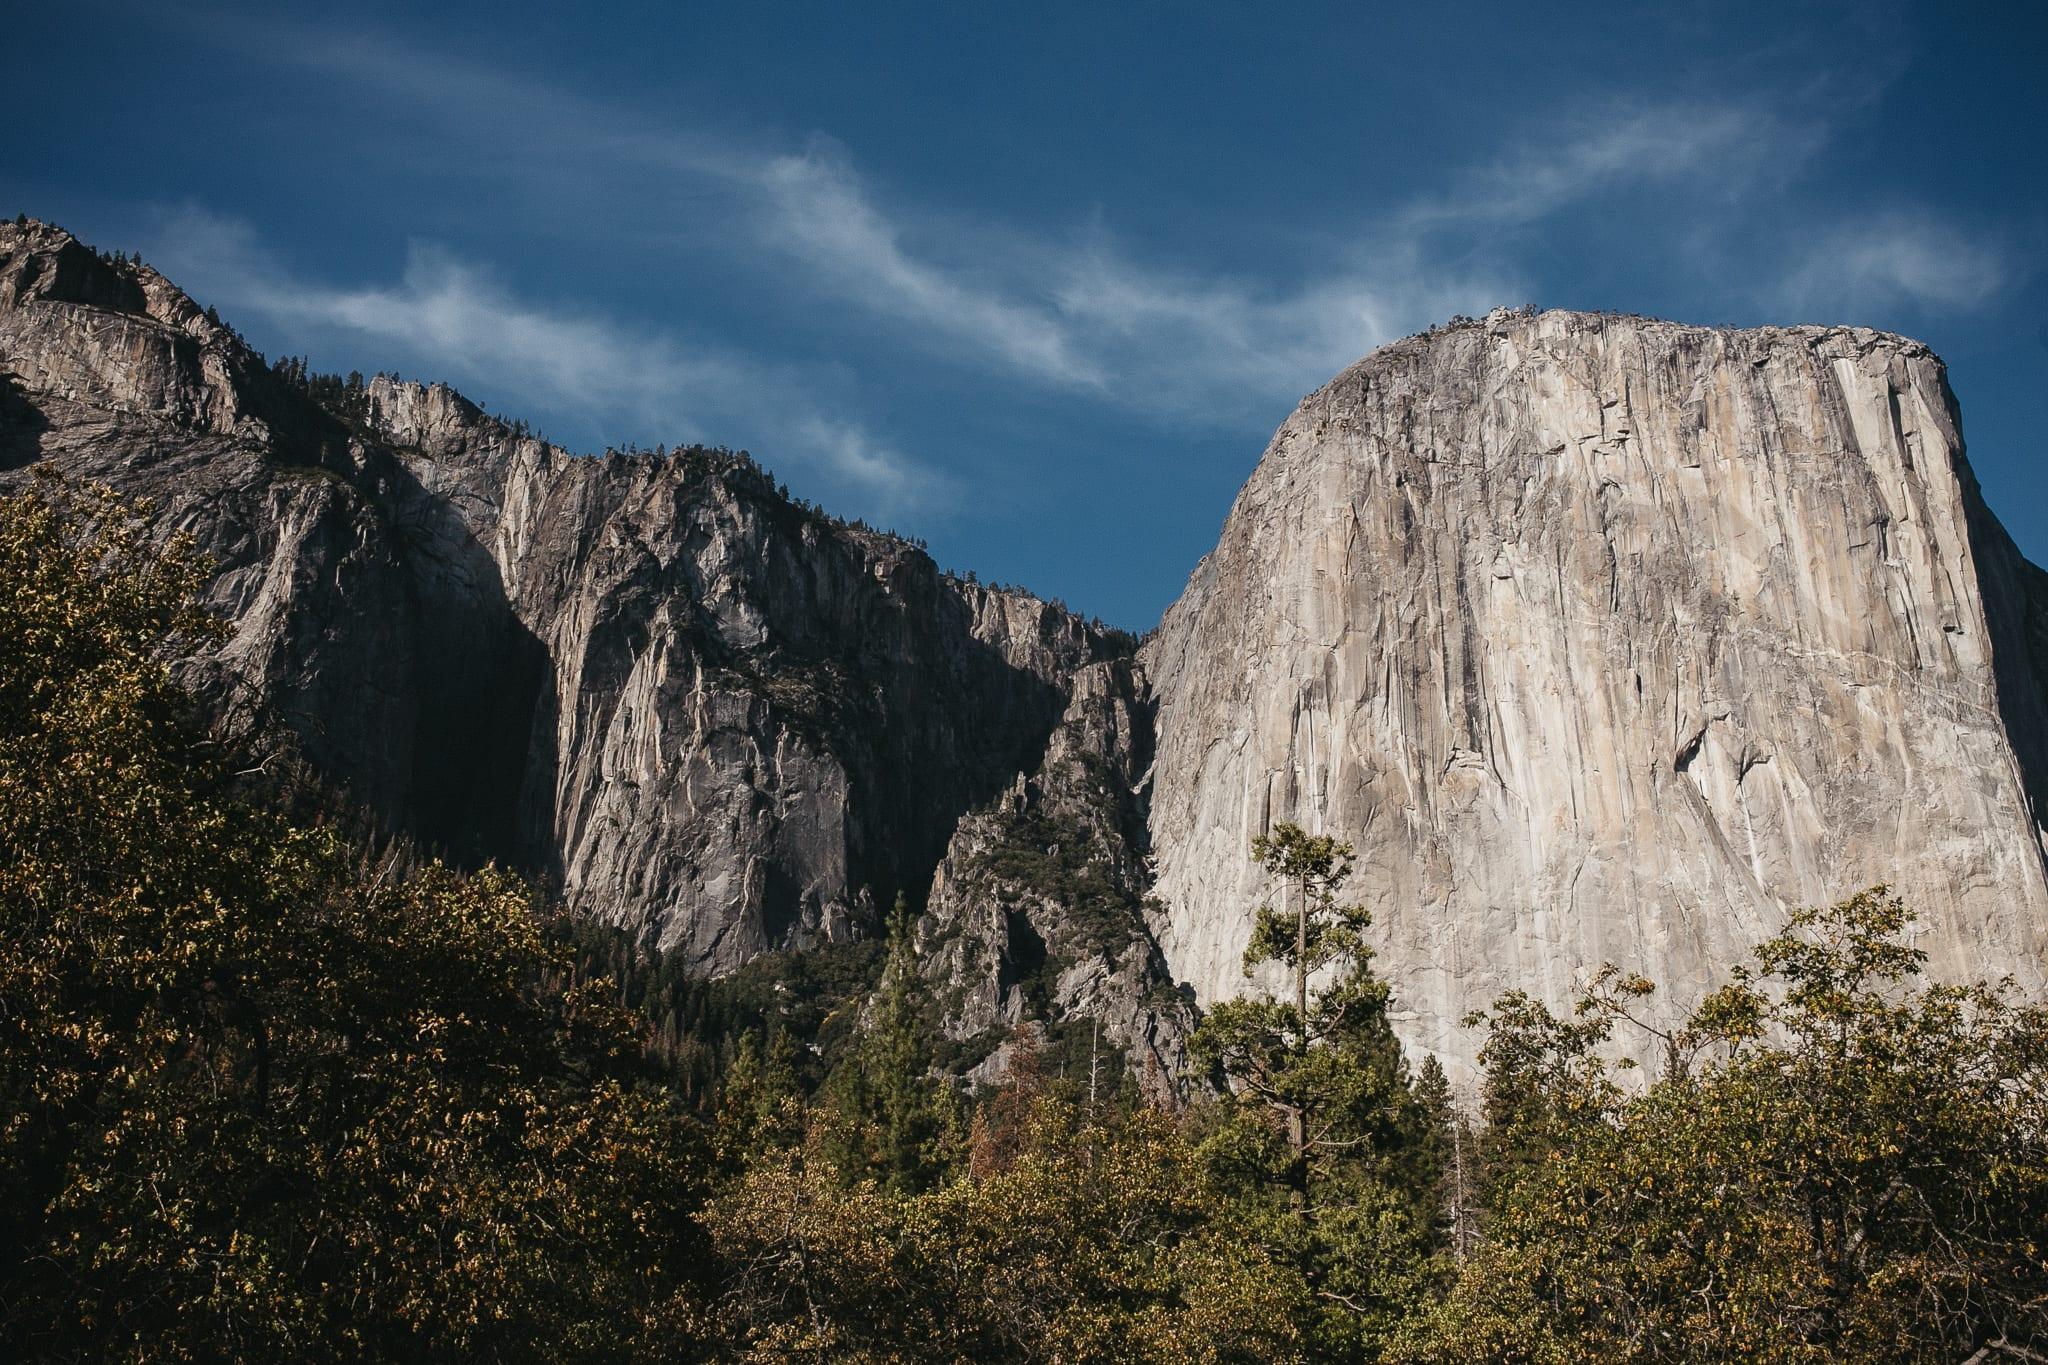 clouds-rest-yosemite-california-engagement-lifestyle-adventure-photographer-31